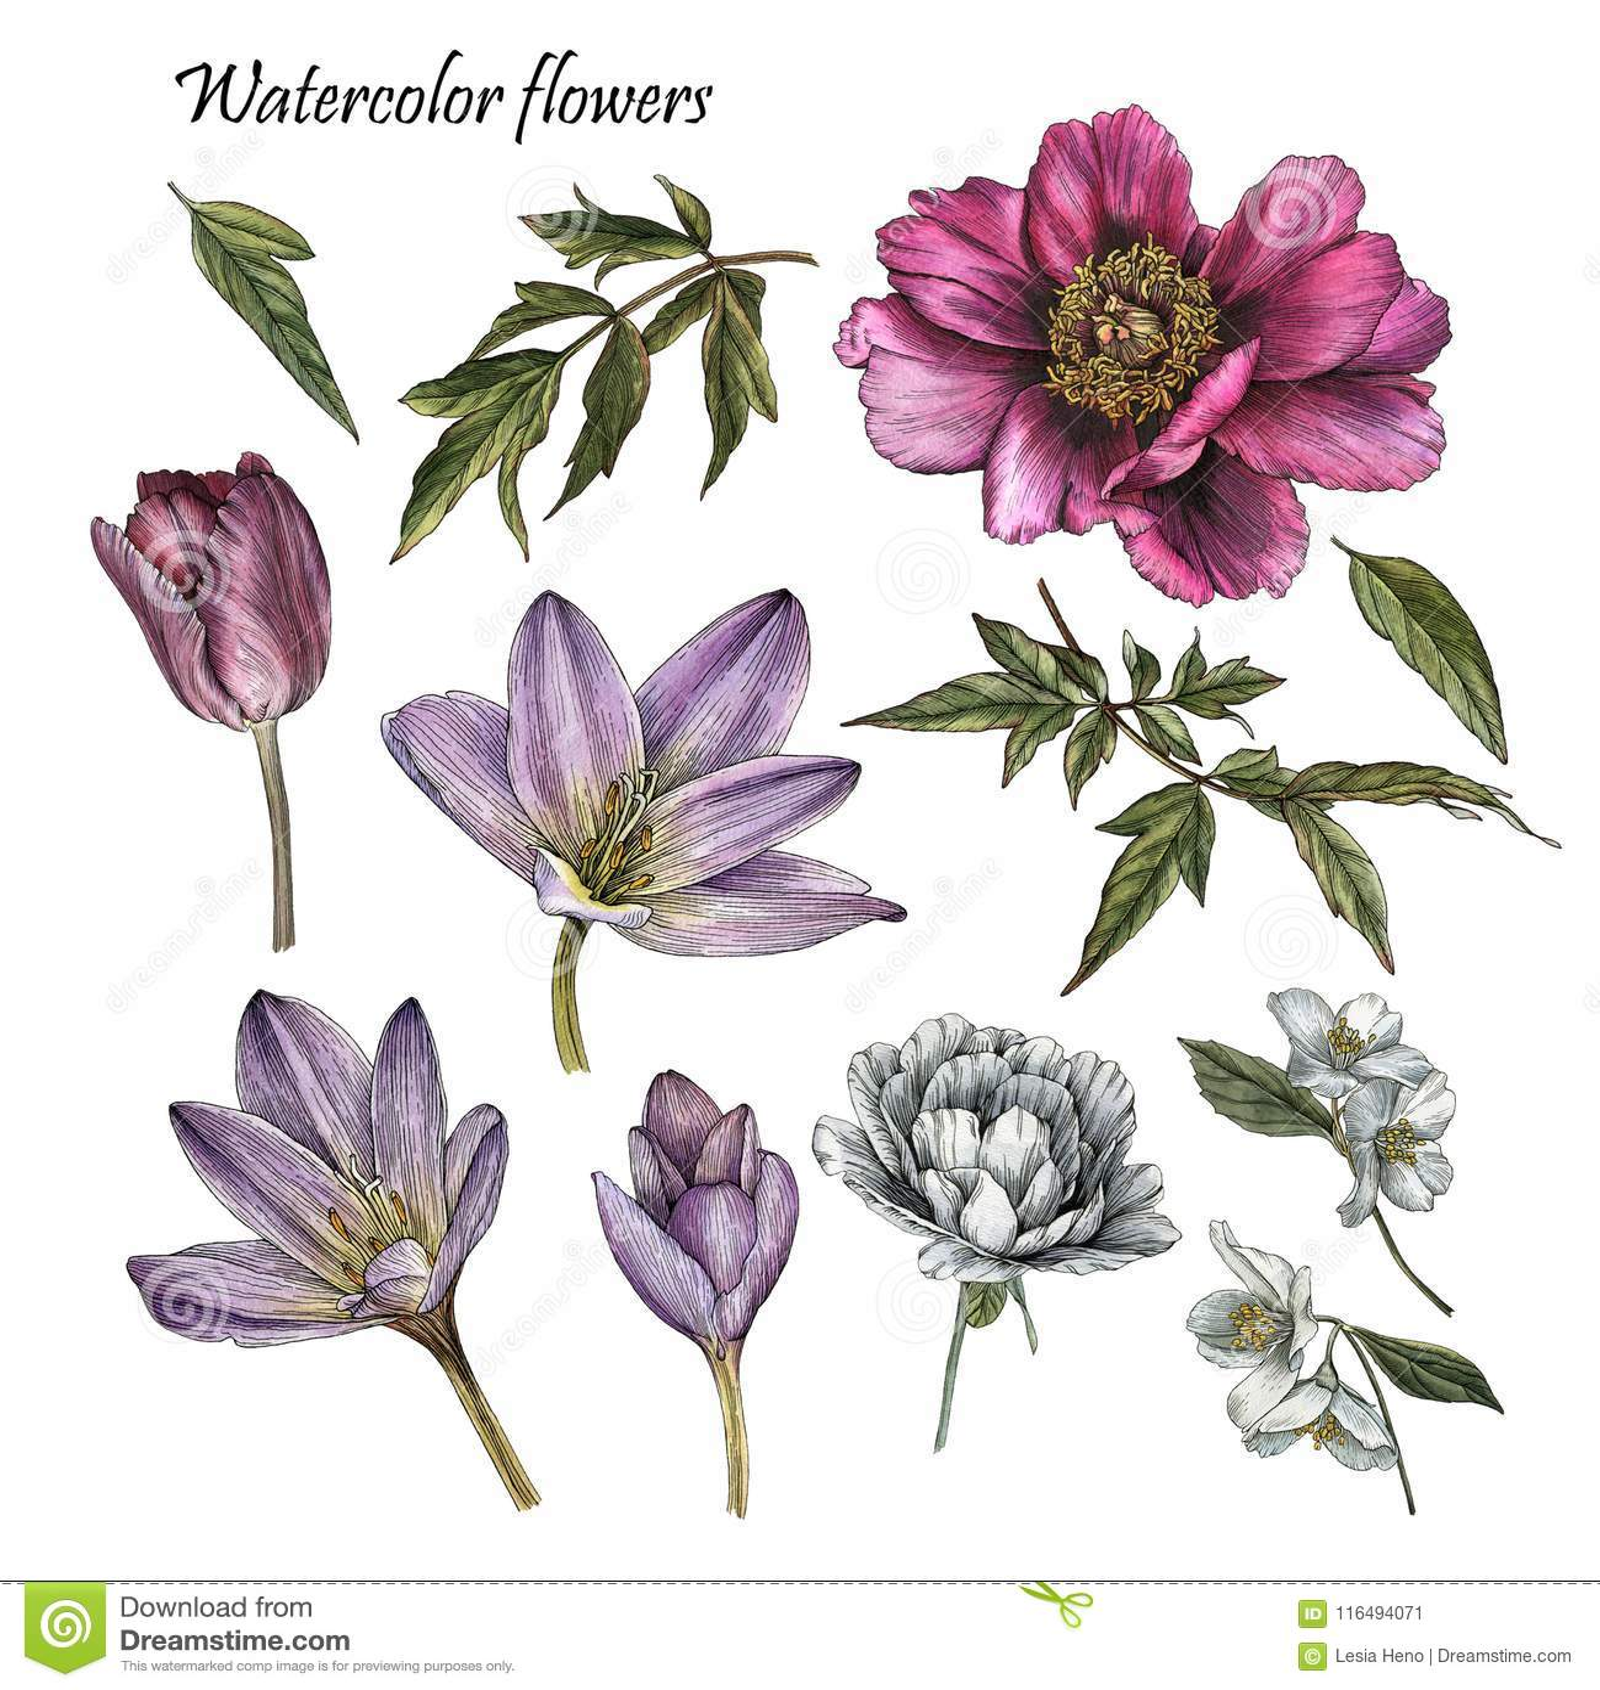 Flowers set of watercolor peony rose tulip jasmine flowers stock flowers set of watercolor purple peony rose tulip white jasmine and leaves izmirmasajfo